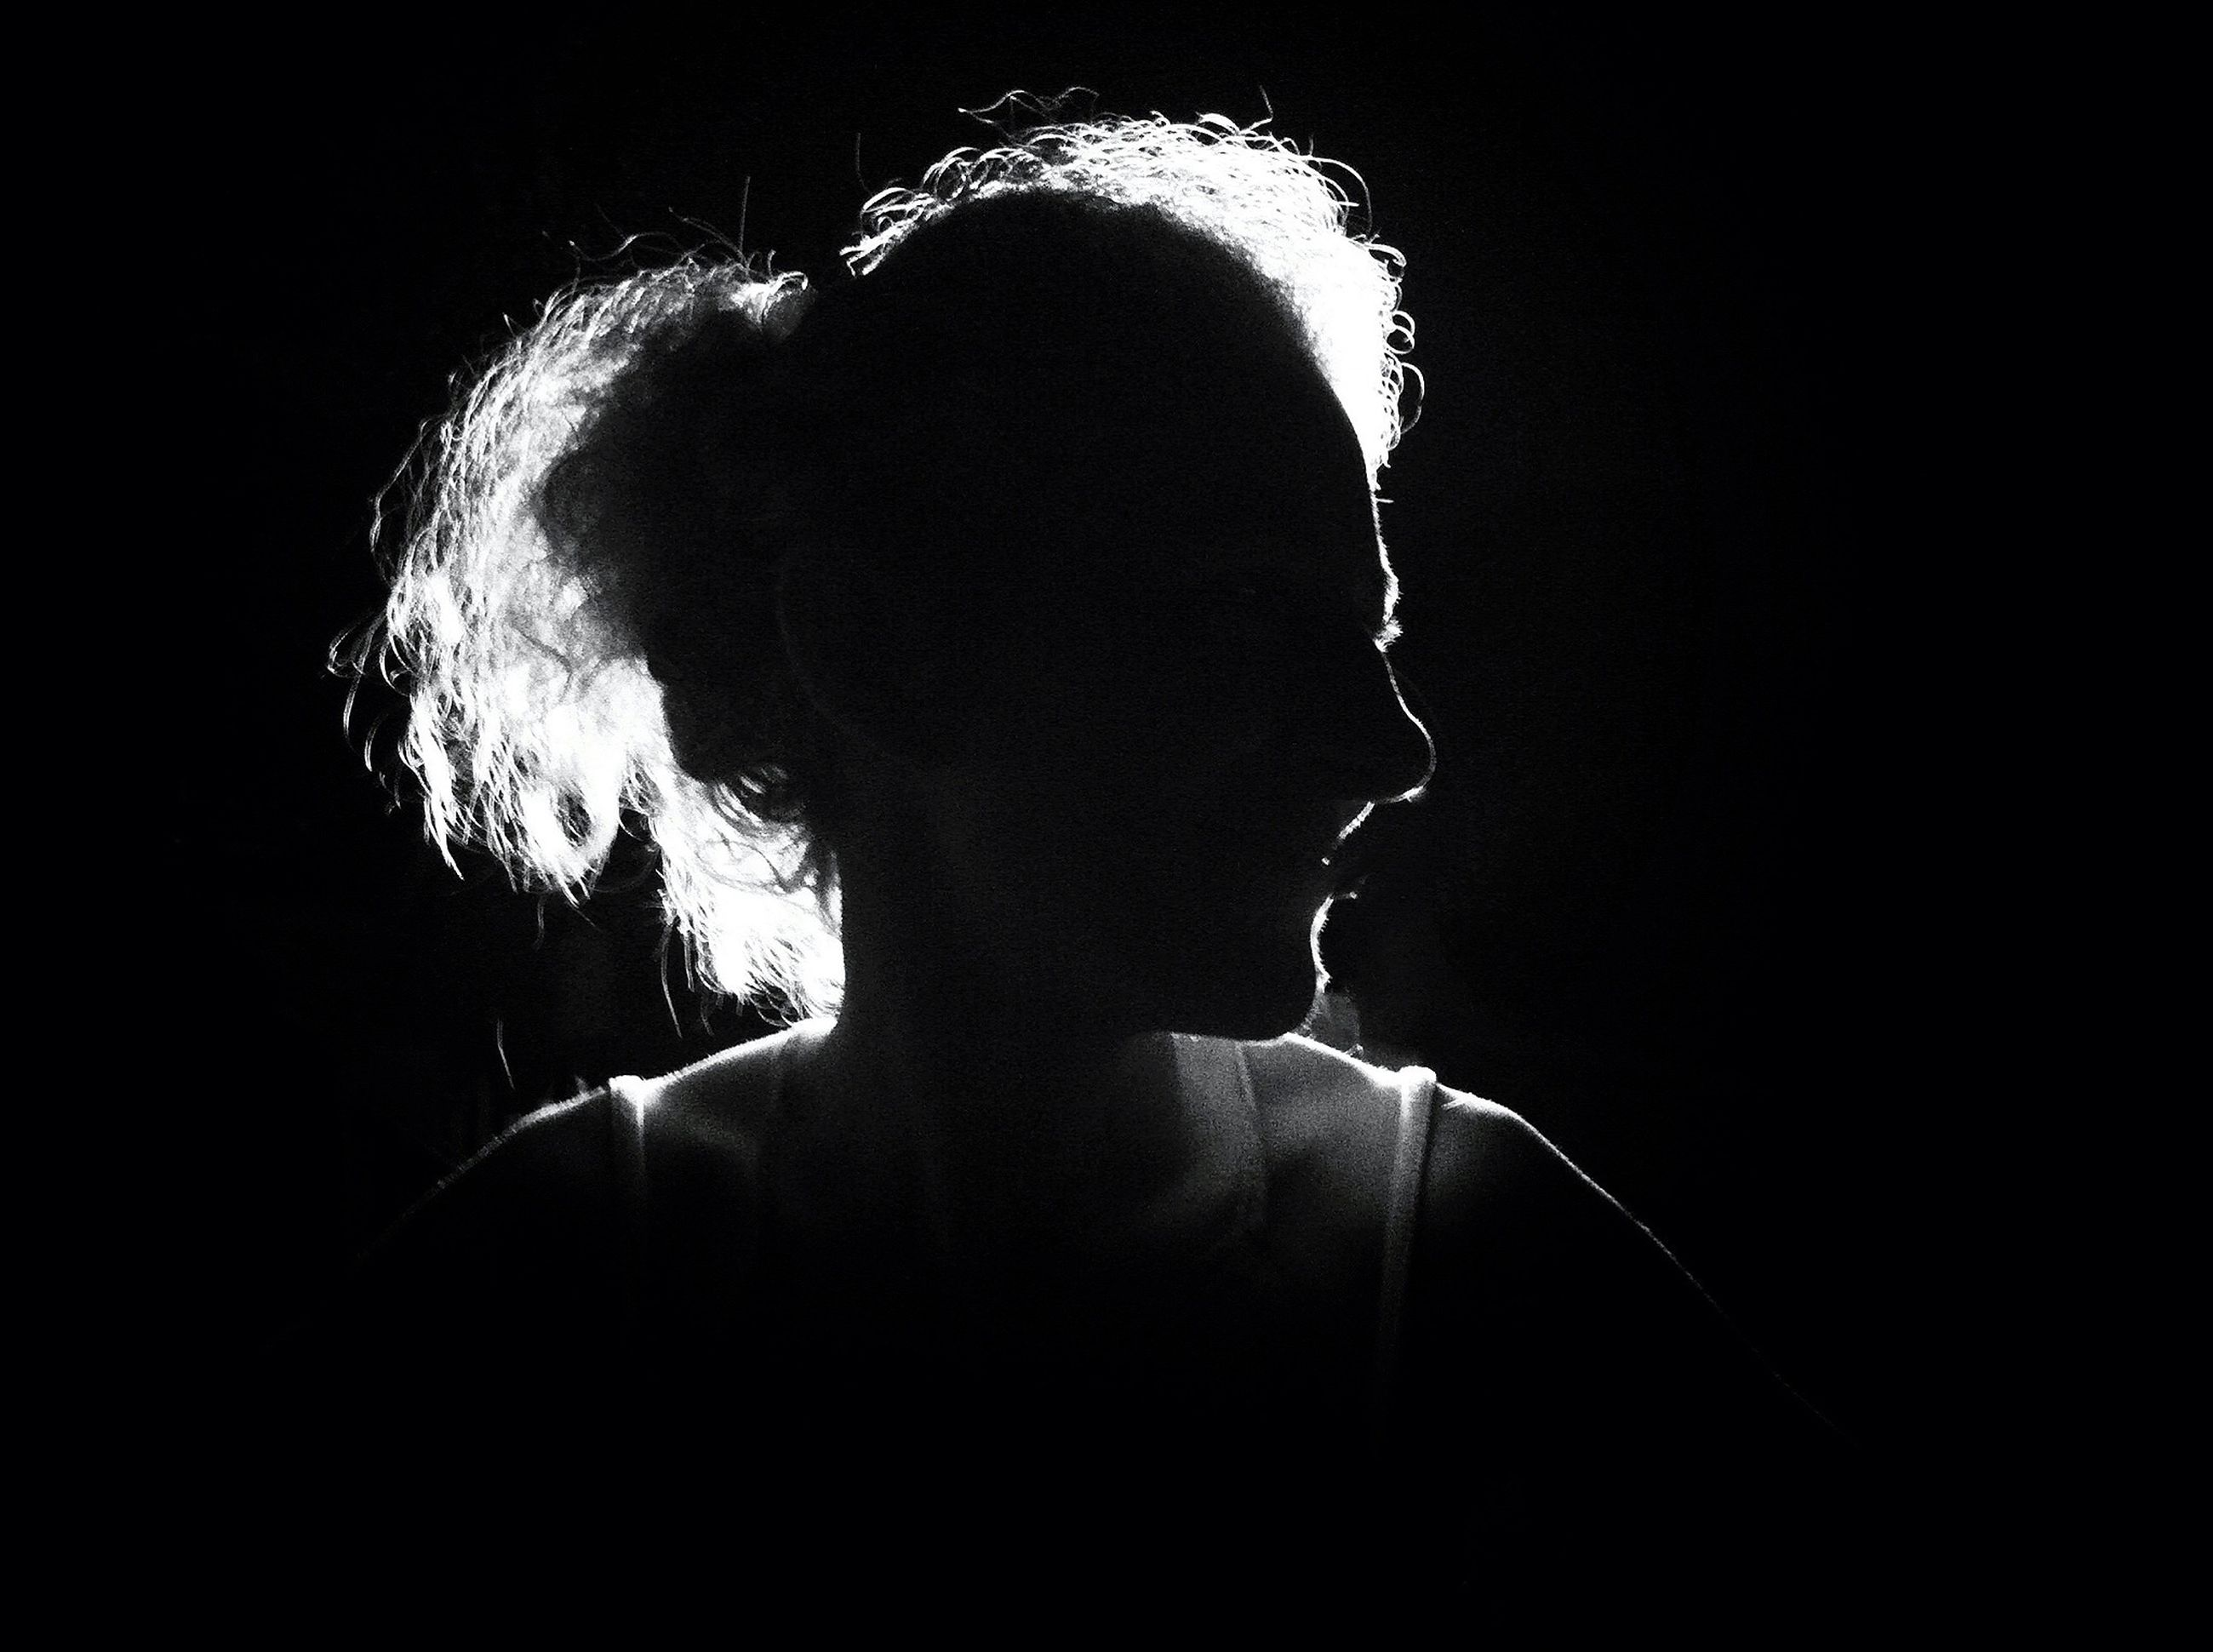 lifestyles, leisure activity, men, night, silhouette, indoors, dark, person, togetherness, love, illuminated, headshot, standing, rear view, holding, three quarter length, light - natural phenomenon